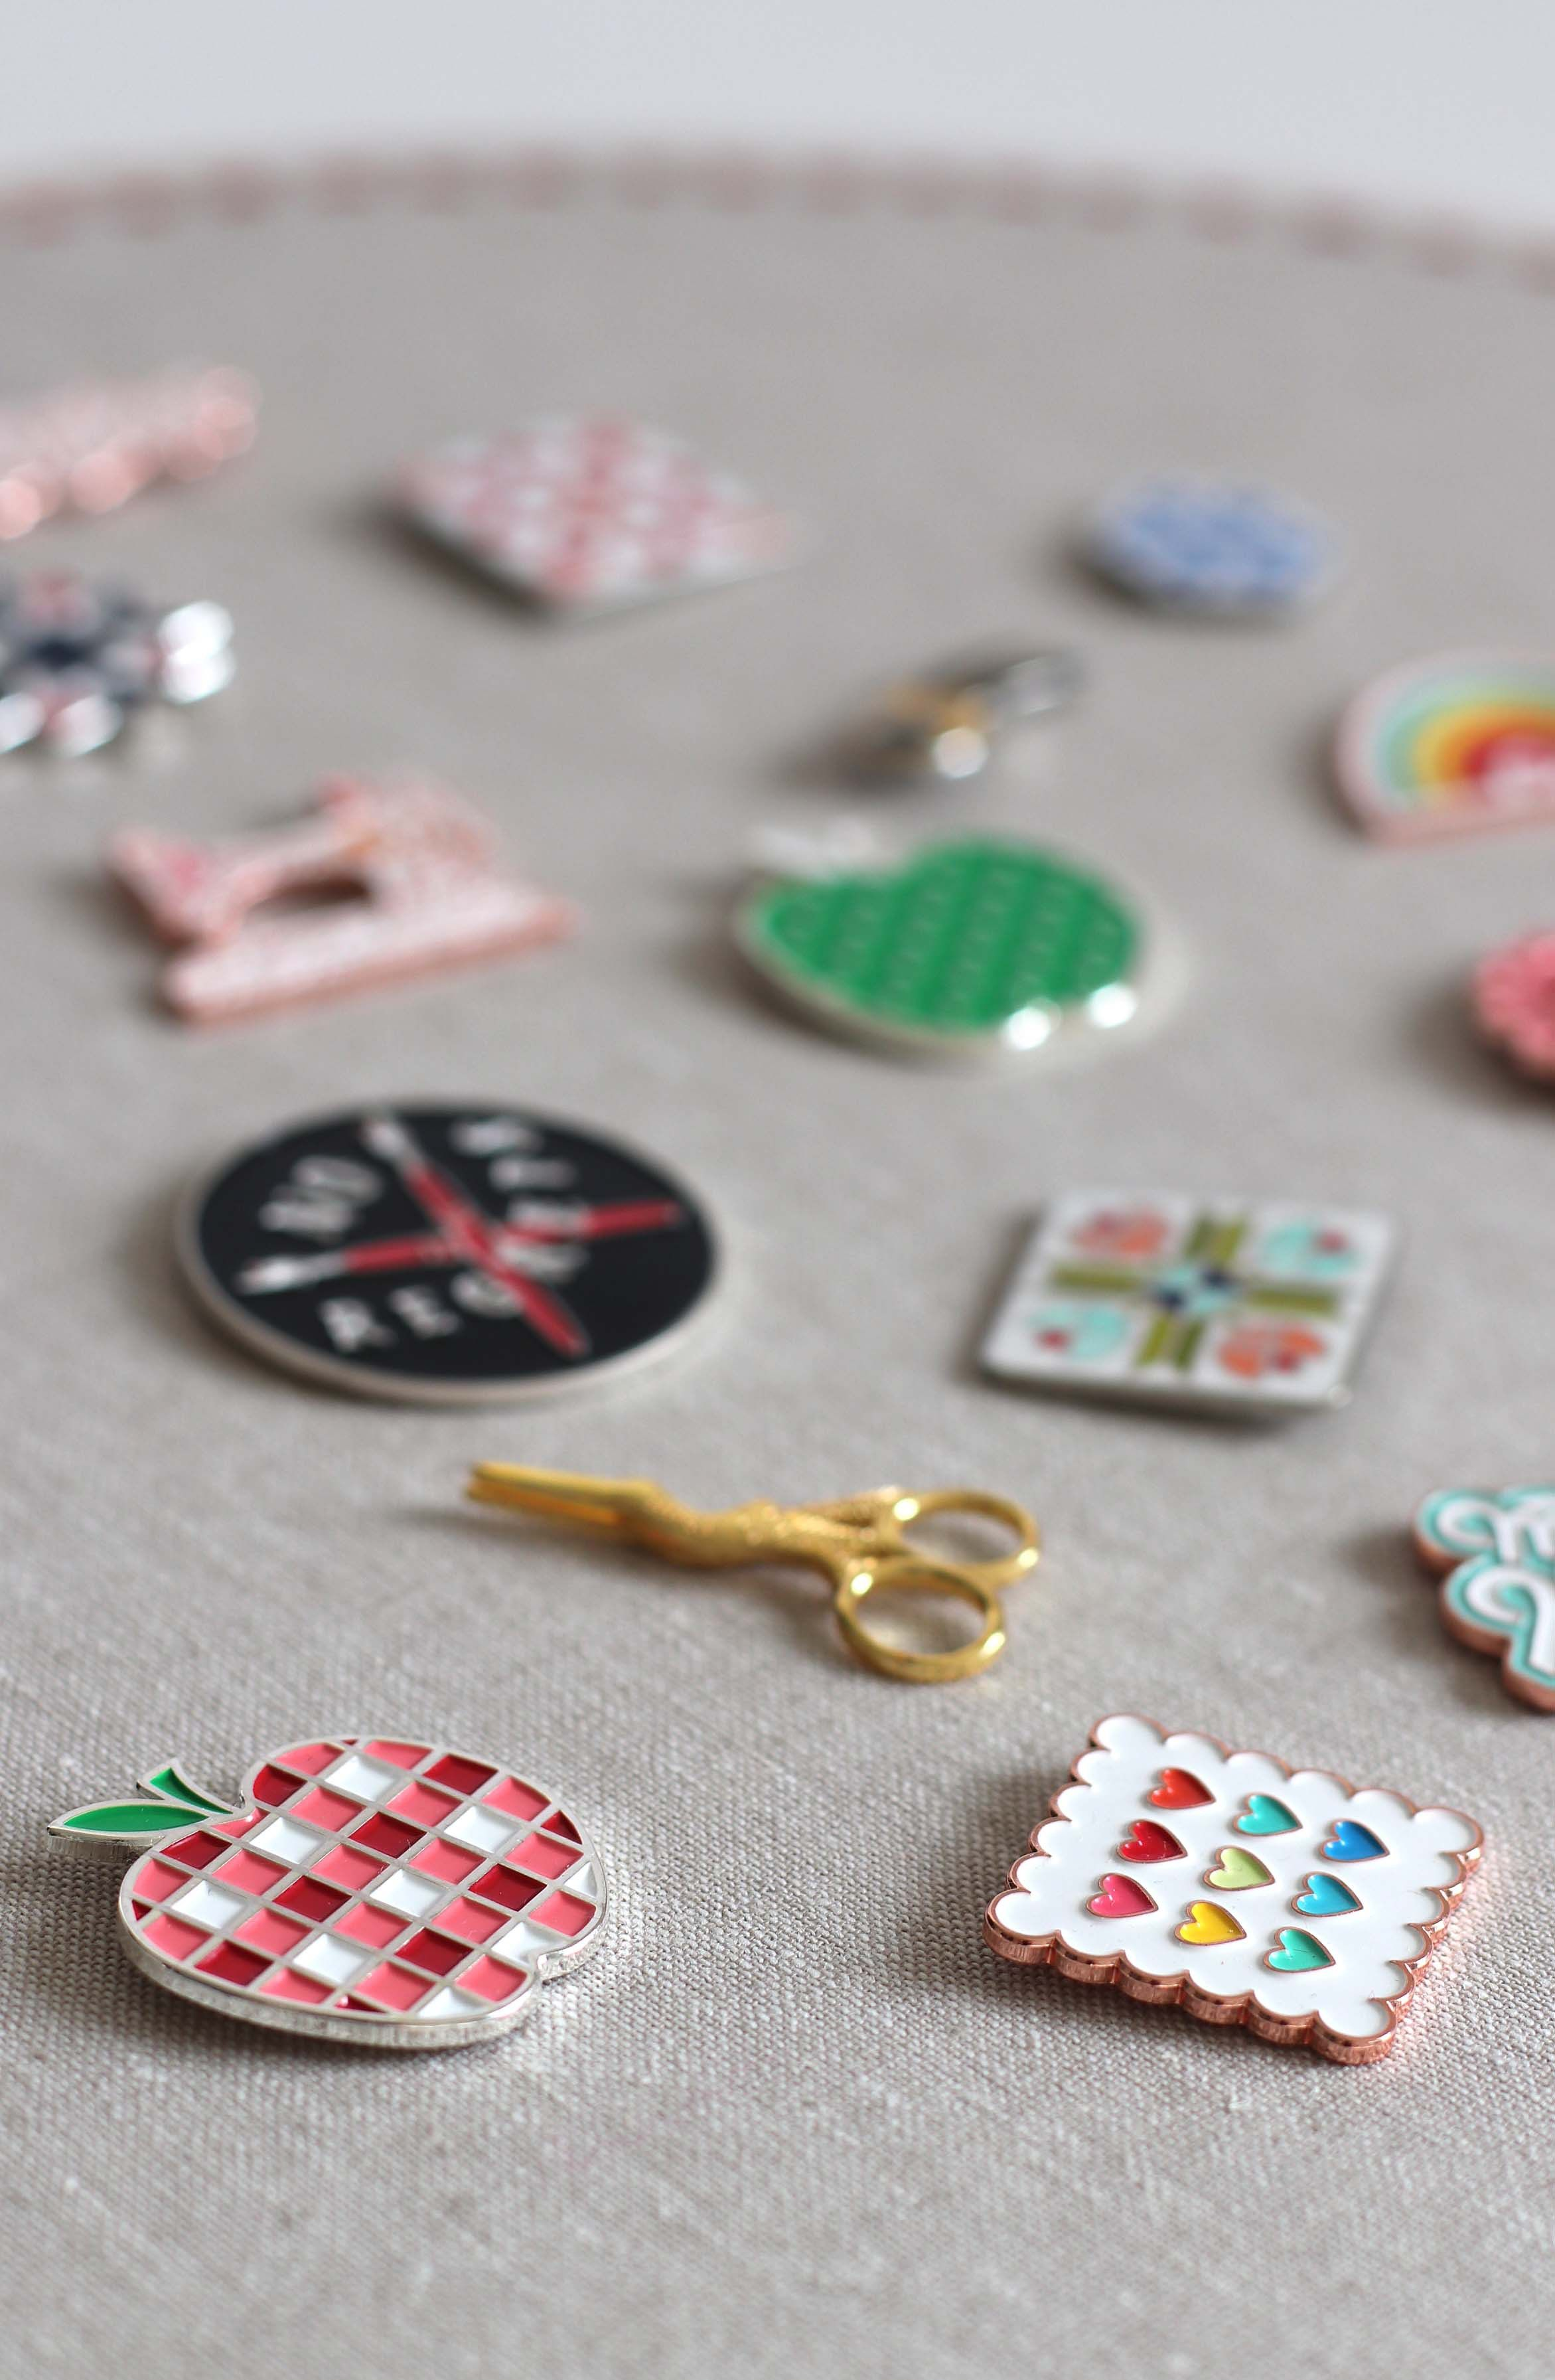 Pin on Photos ideas